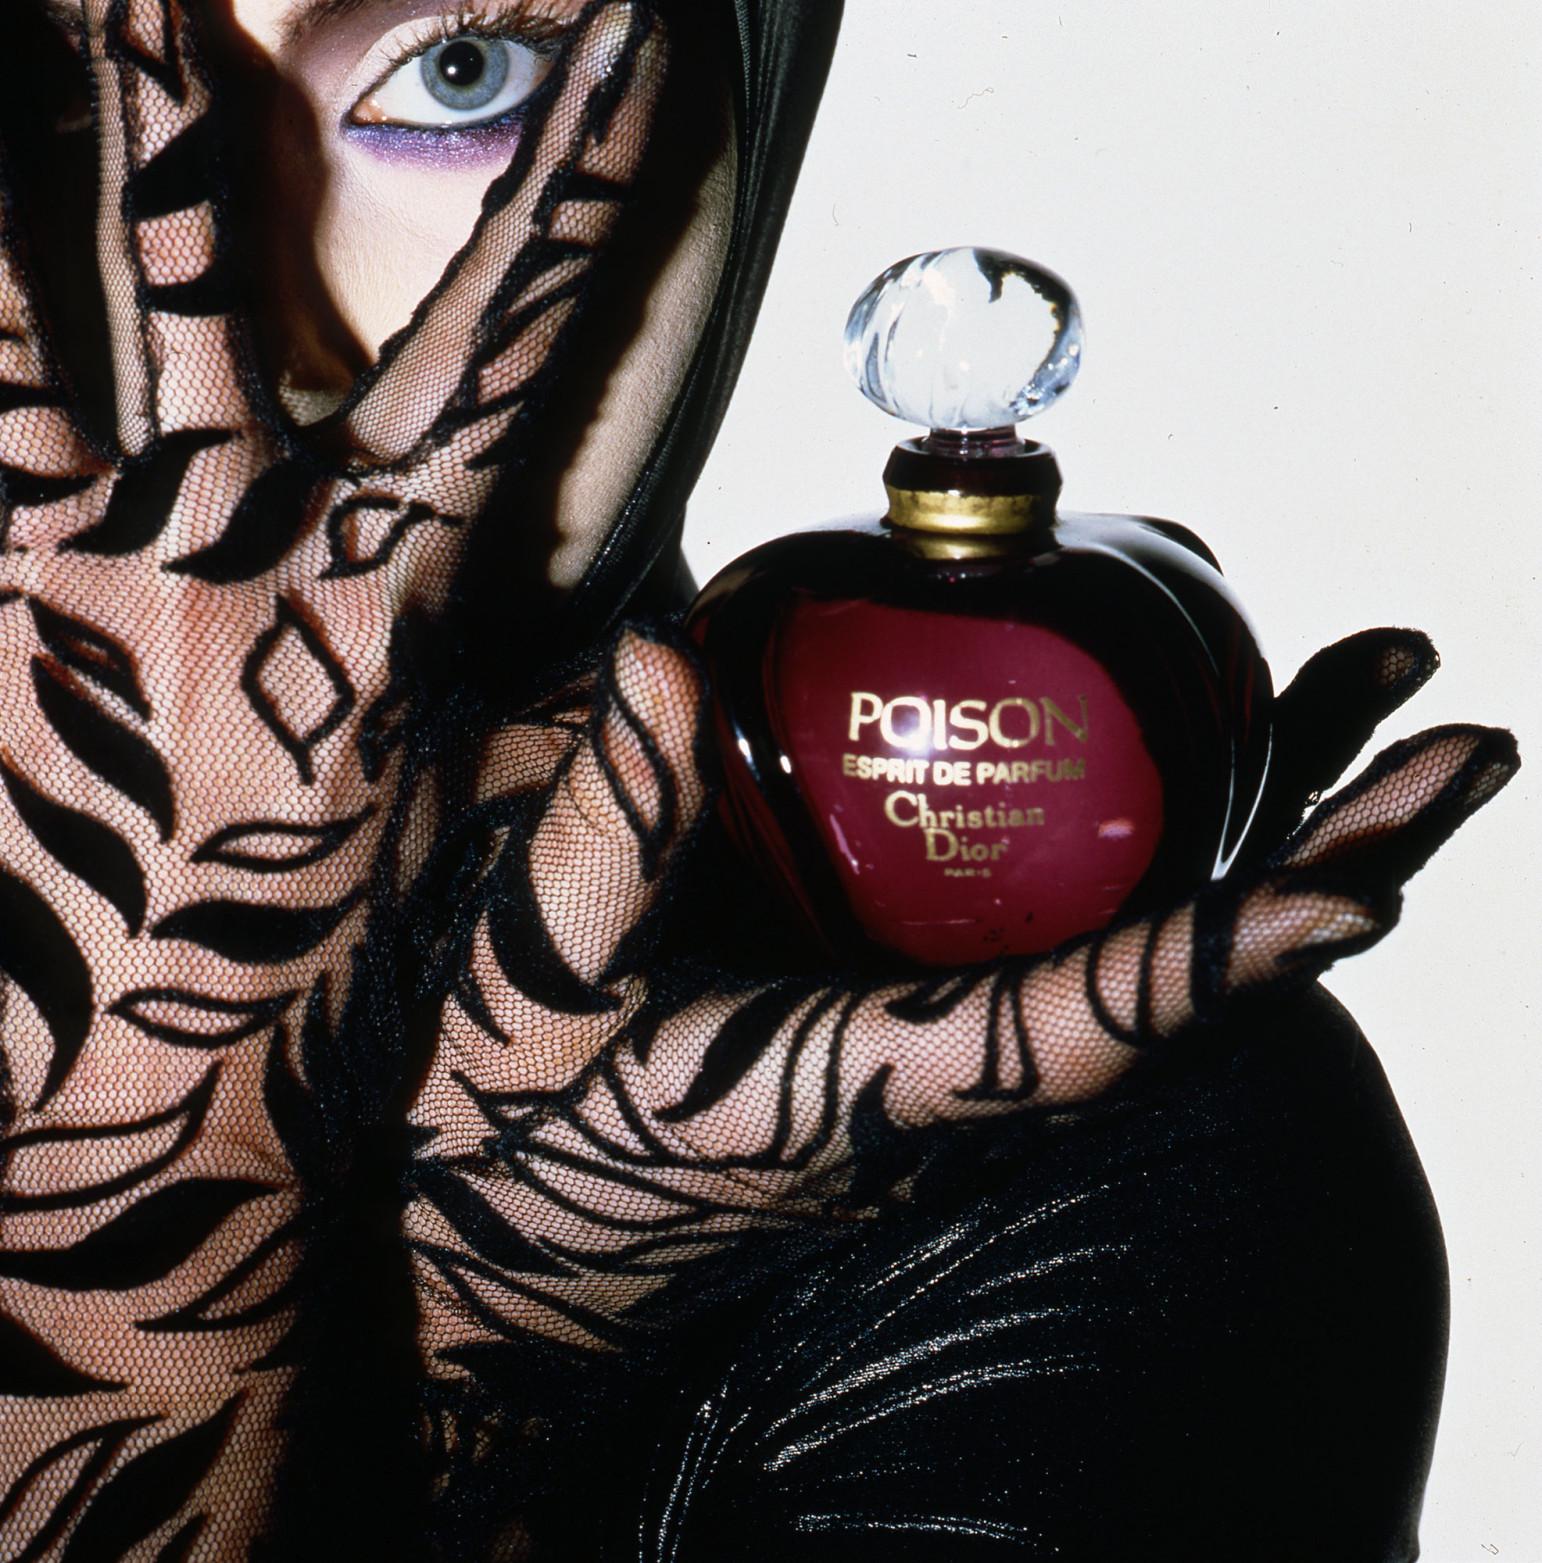 Perfume Bighouse : Poison - Christian Dior